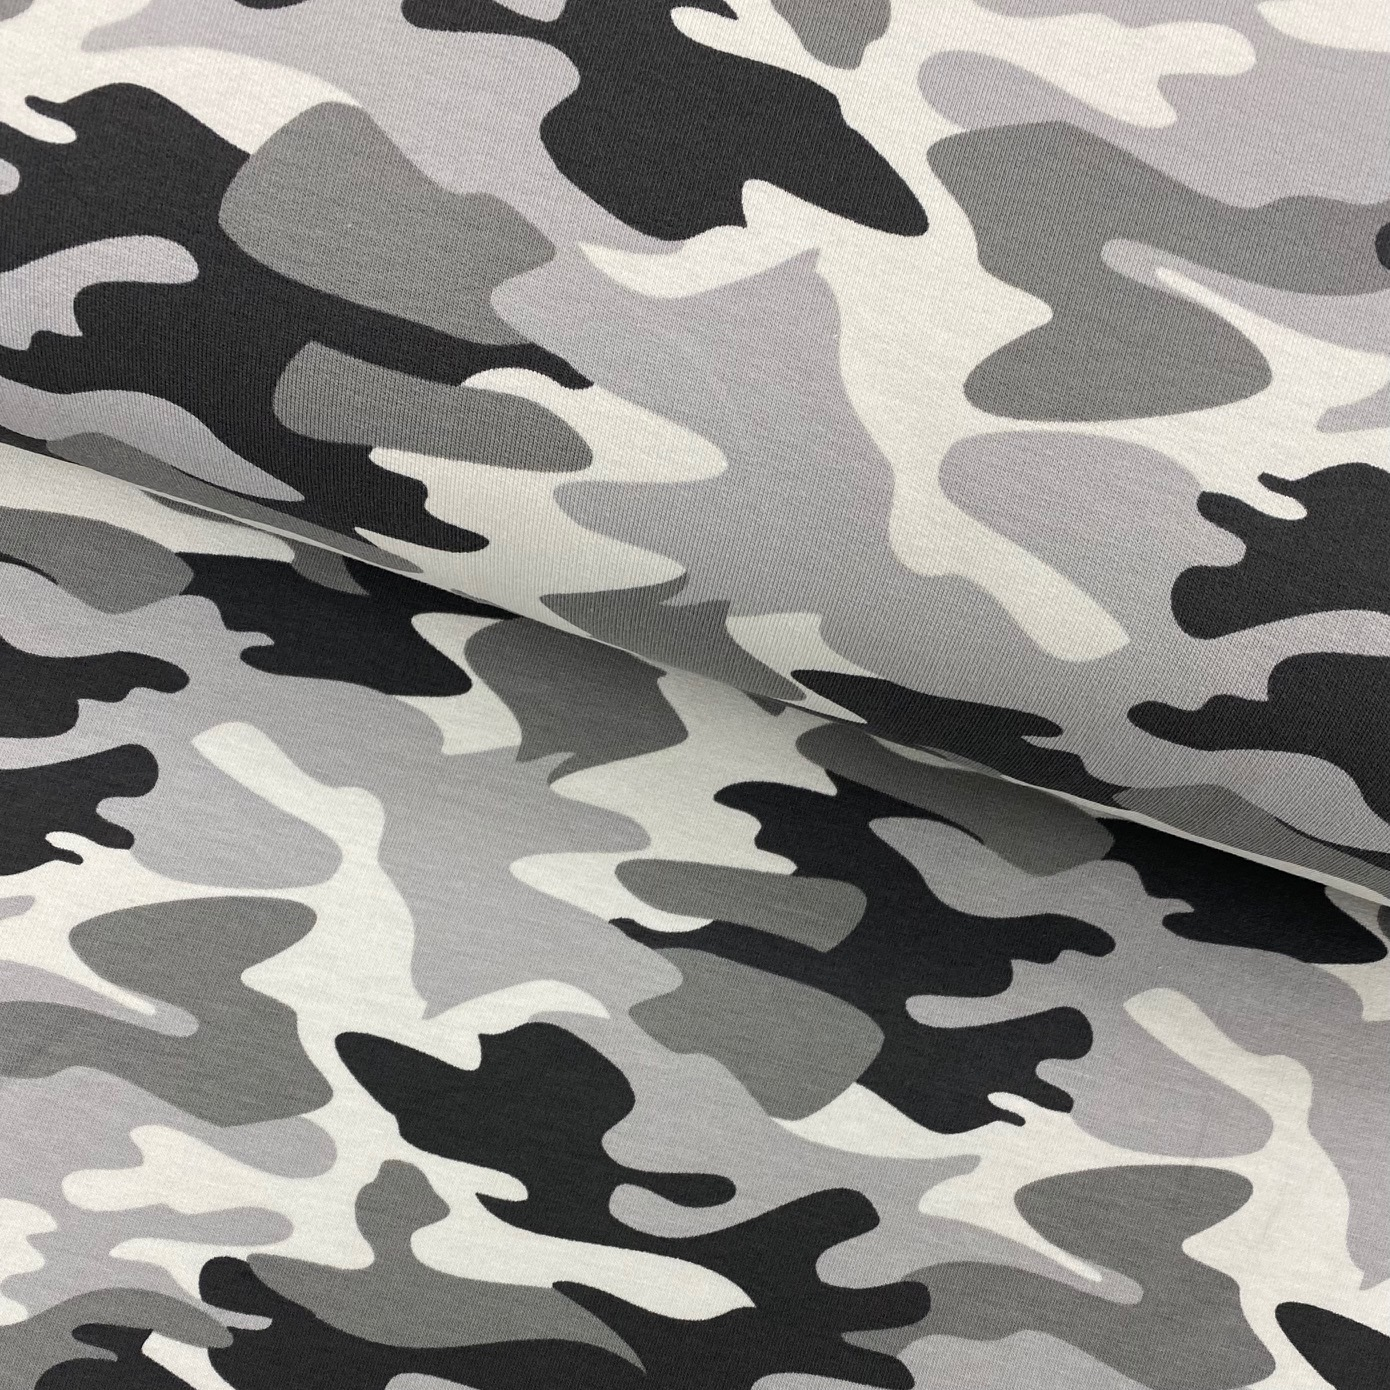 Sweat French Terry, angeraut, Camouflage dunkelgrau/beige.  Art. 4979-1264